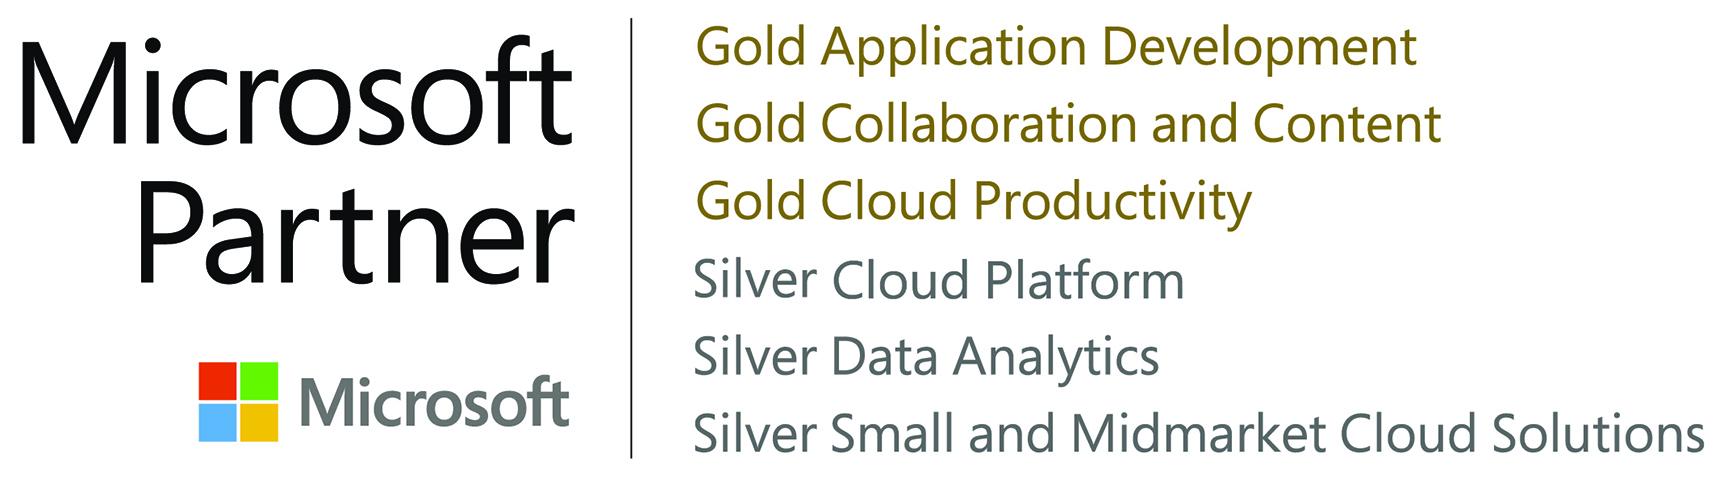 Microsoft gold partner dmc inc dmcs microsoft gold partner logo with competencies xflitez Images